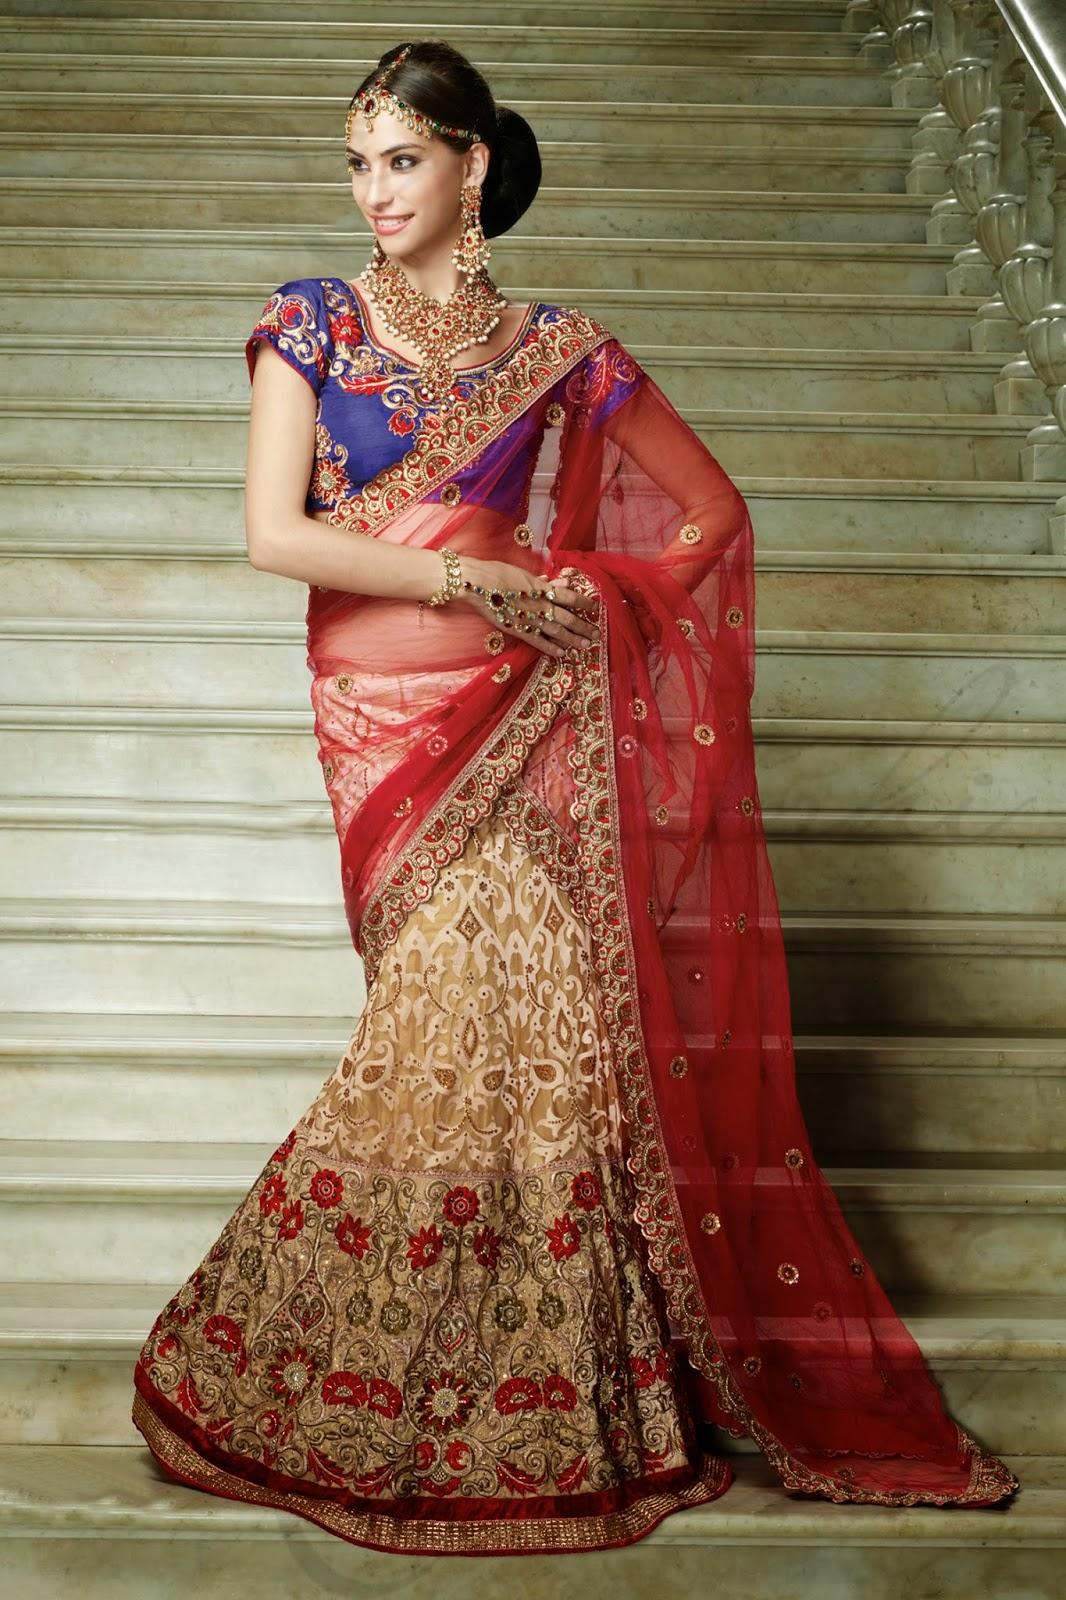 Bridal Lehenga for Wedding: Perfect Wedding Outfits for Ladies-Lehenga Style Saree